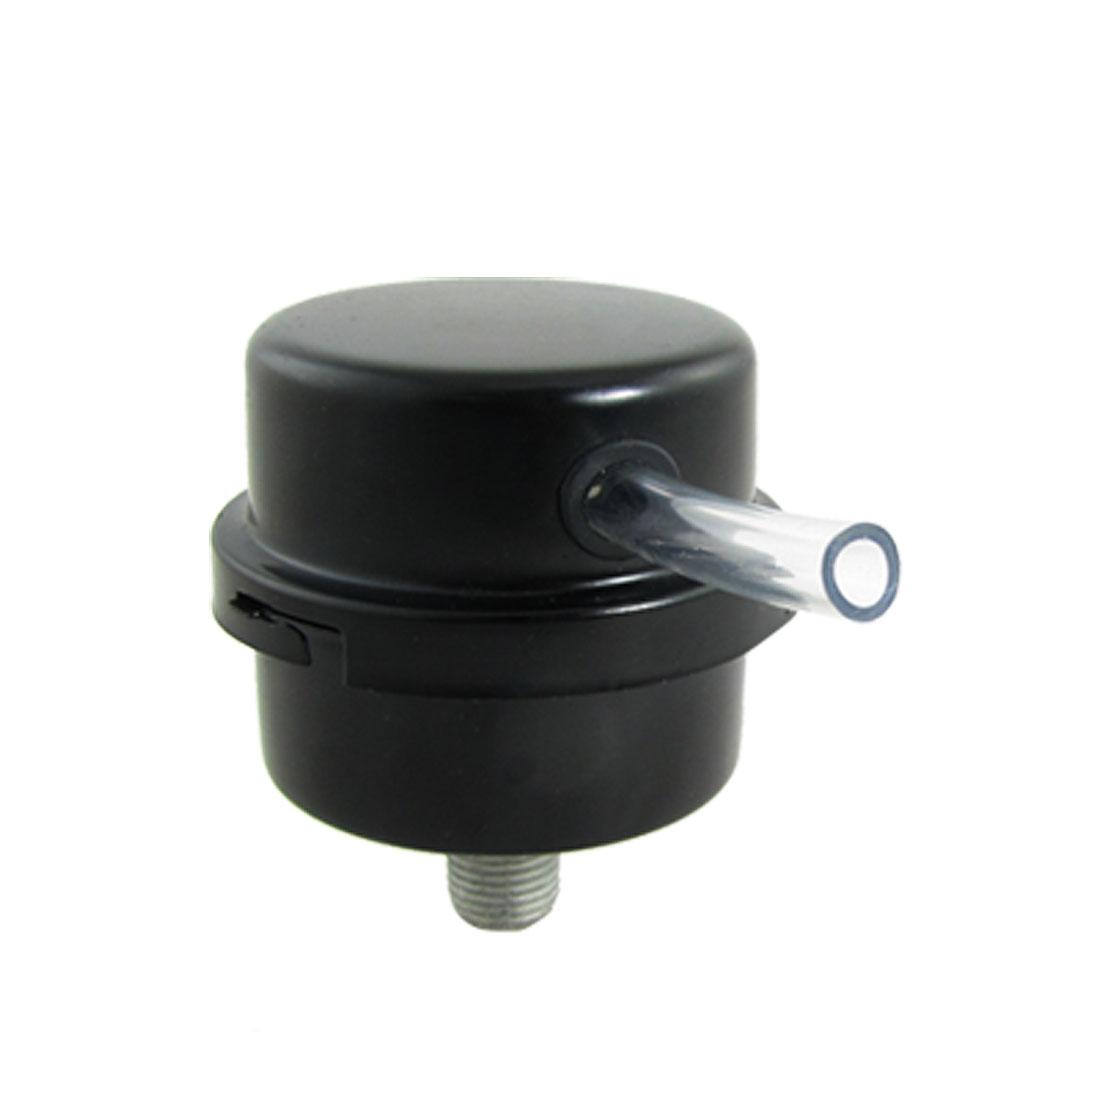 Air Compressor Admitting Port Metal Muffler Silencer